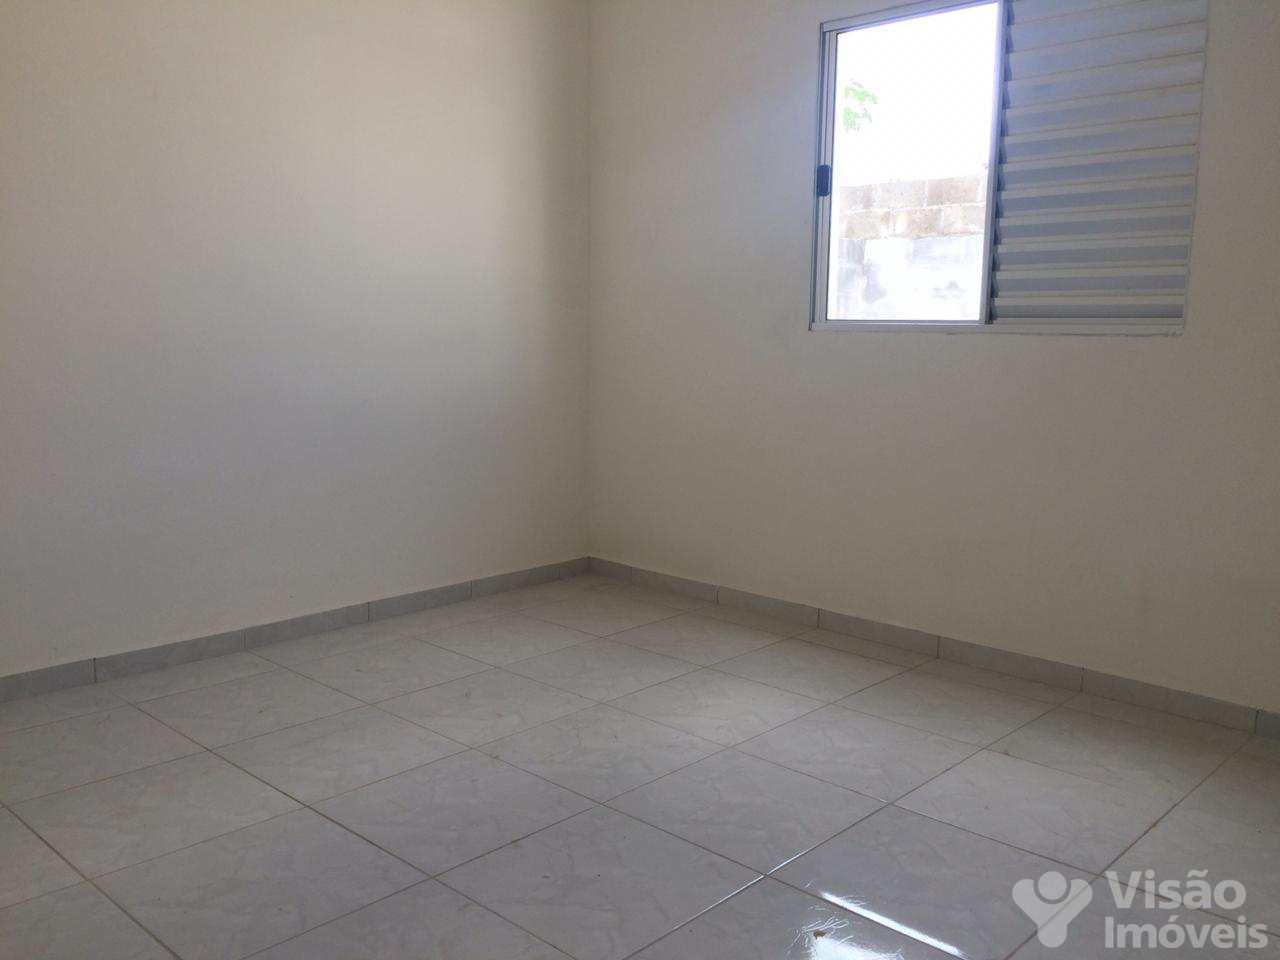 Casa com 2 dorms, Residencial Comercial Cidade Vista Alegre, Pindamonhangaba - R$ 142 mil, Cod: 1920024